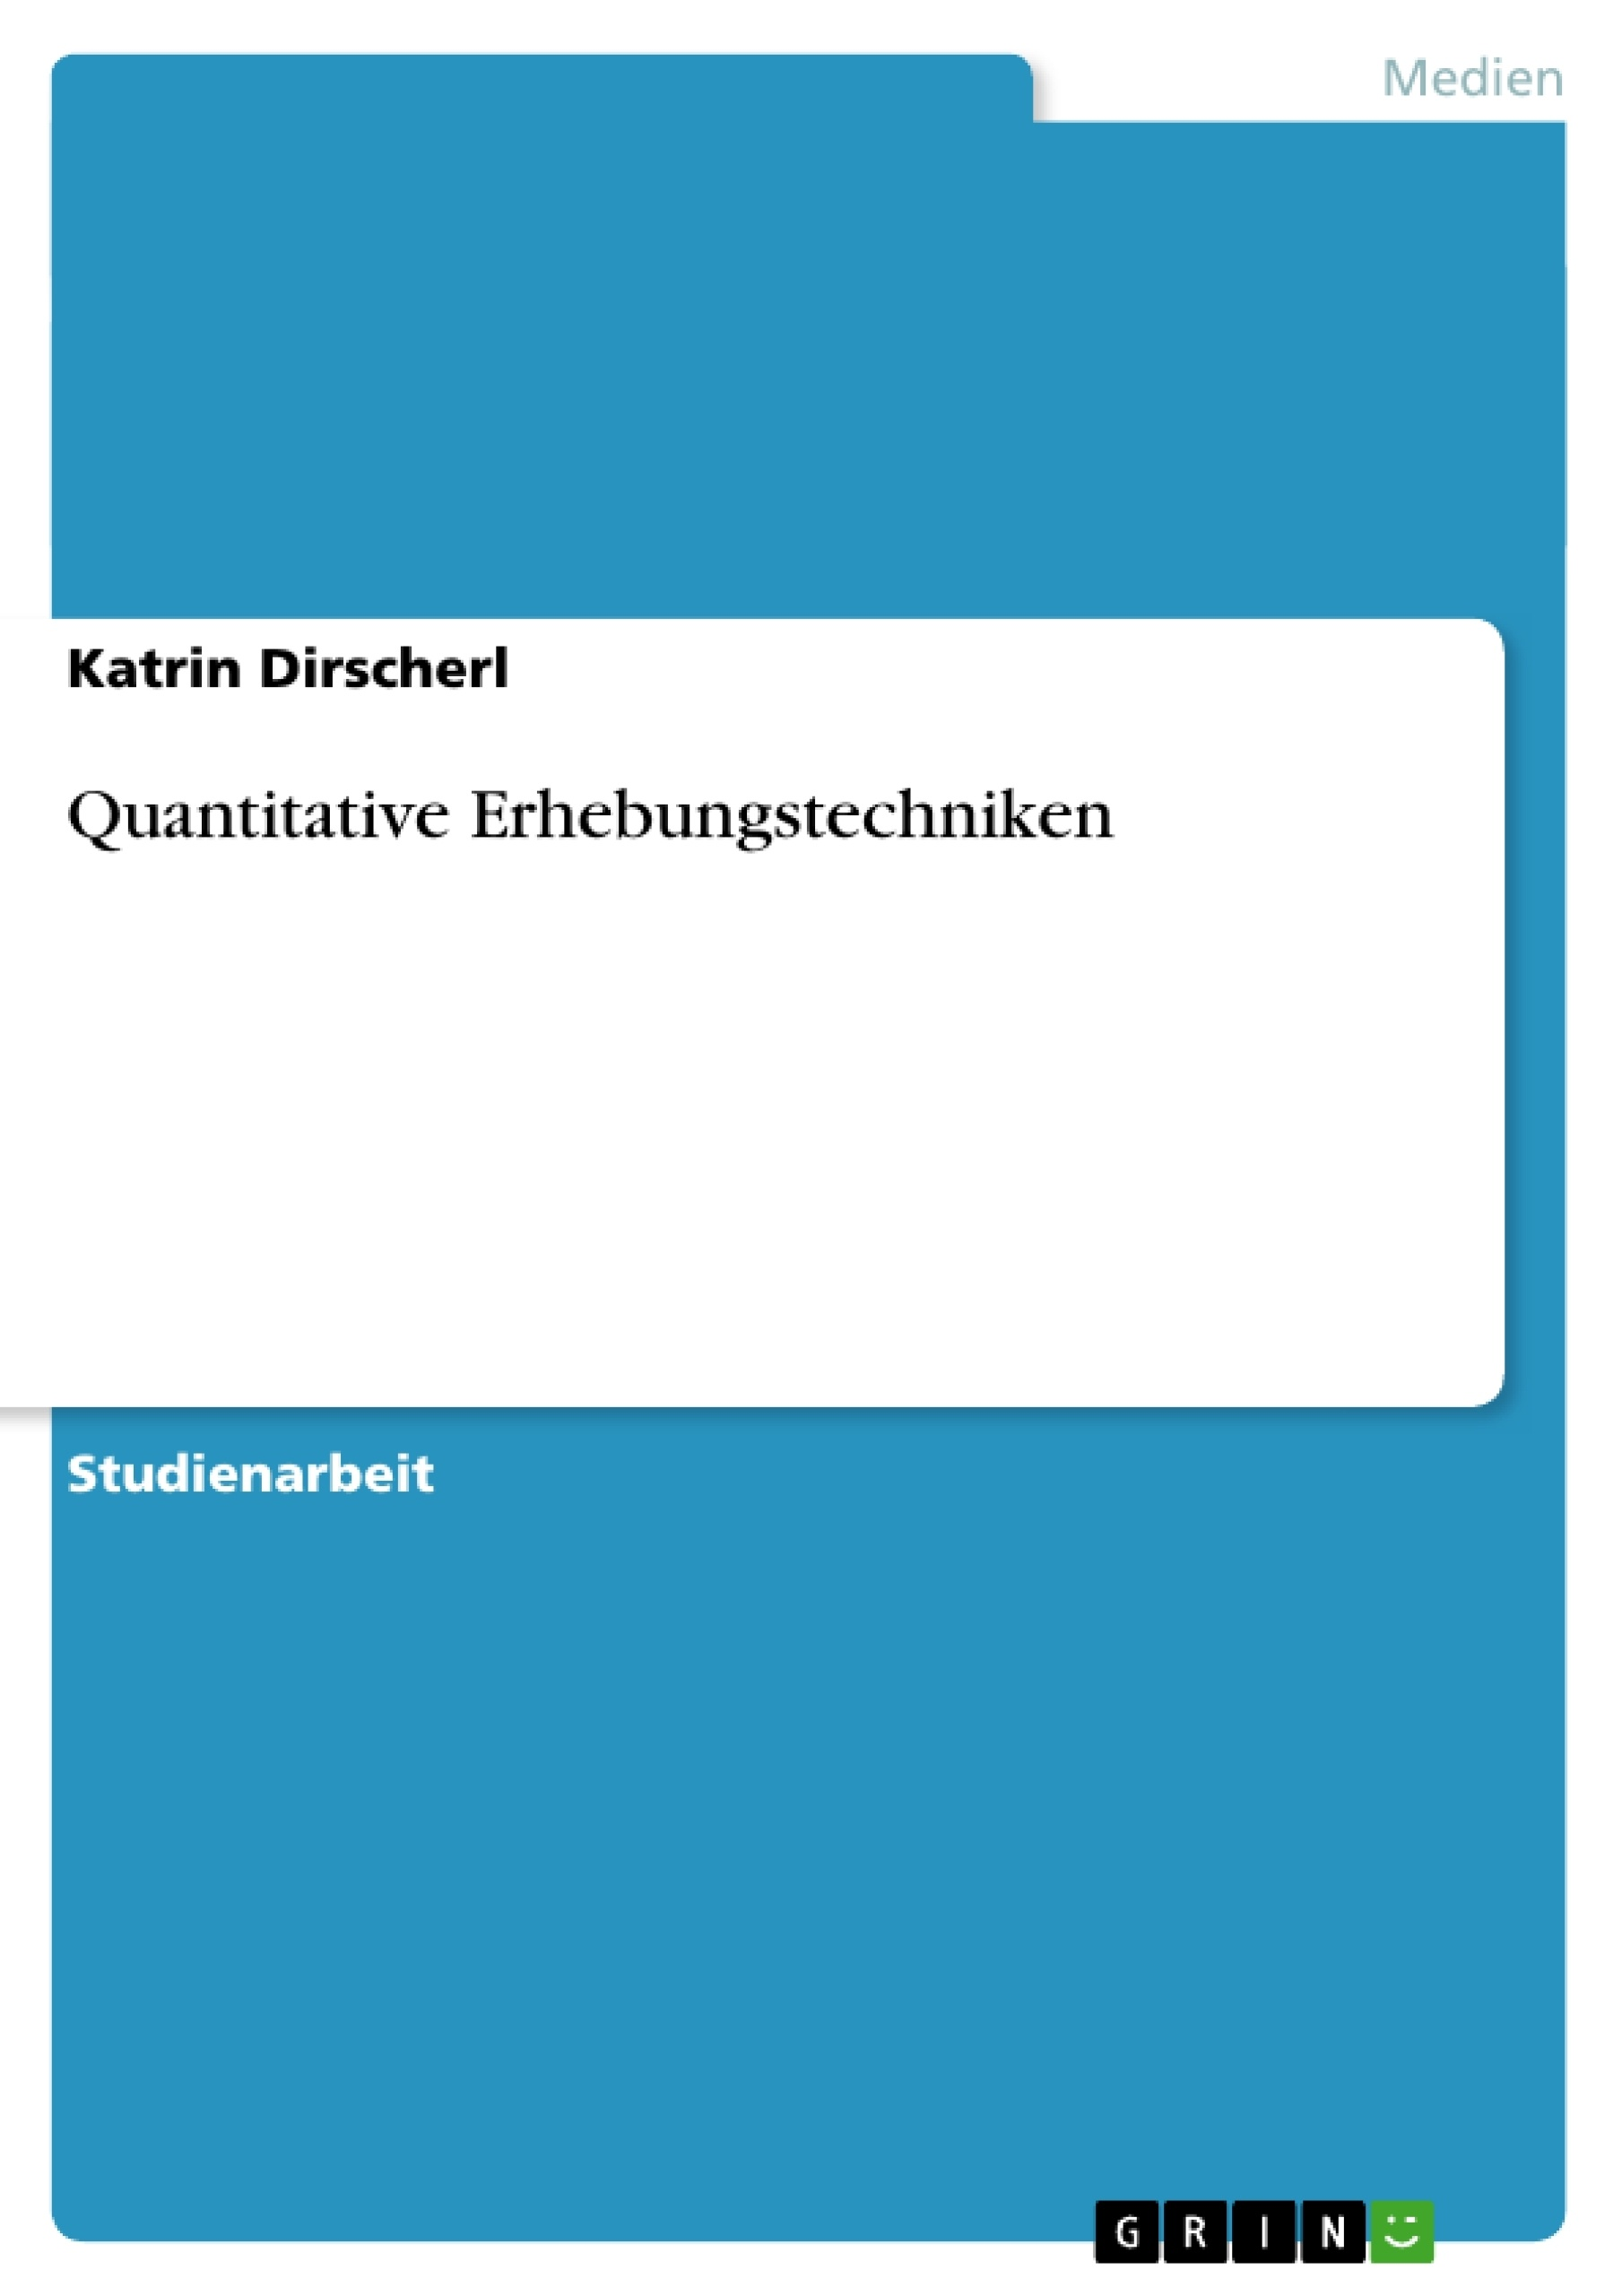 Titel: Quantitative Erhebungstechniken